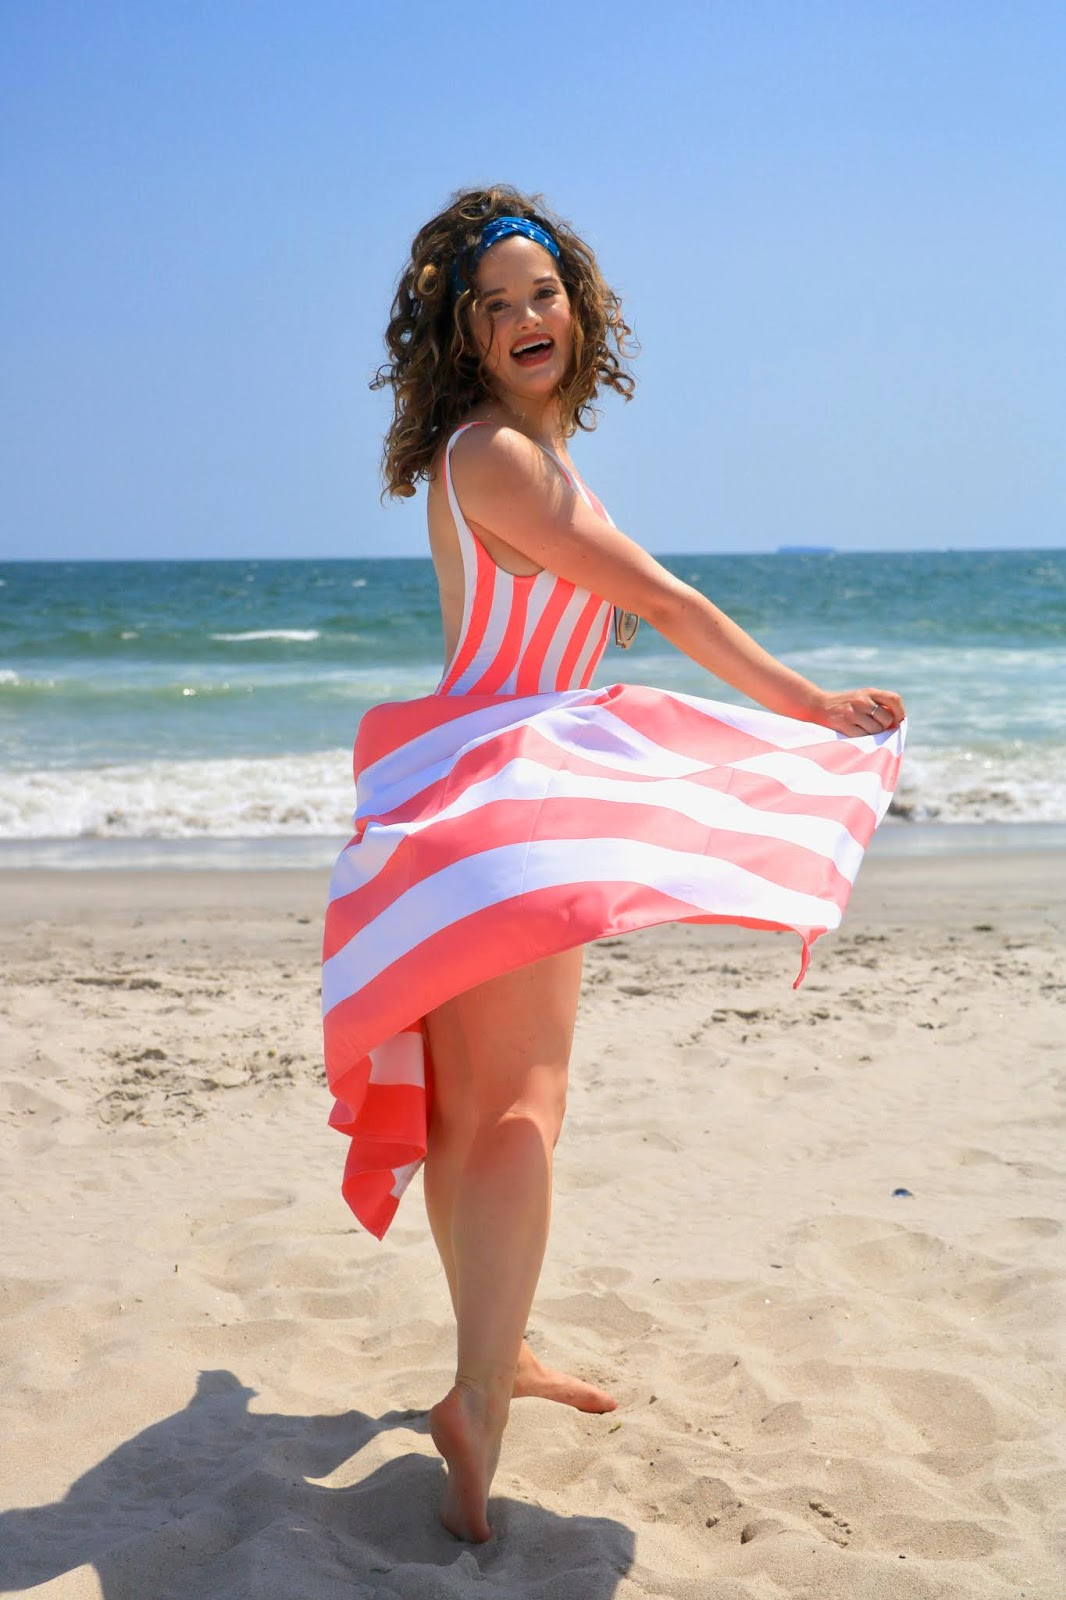 Nyc fashion blogger Kathleen Harper's beach photo shoot ideas.